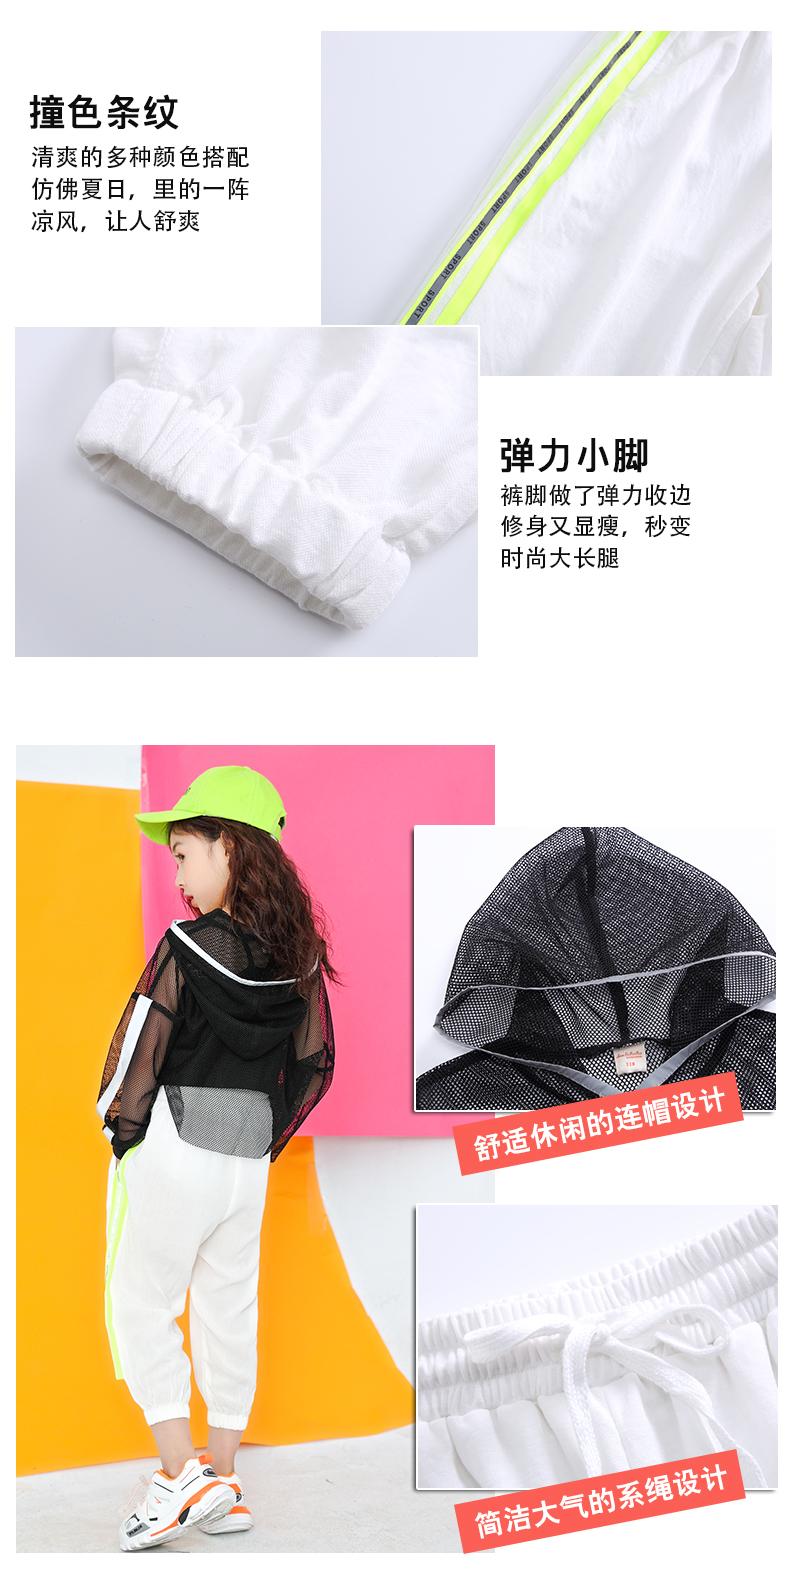 Toddler Girls Oversize Full Sleeve Hoodies Hip Hop Ballroom Jazz Dance Costumes Kids Boy Skirttrousers Clothing Set Team Wear (6)